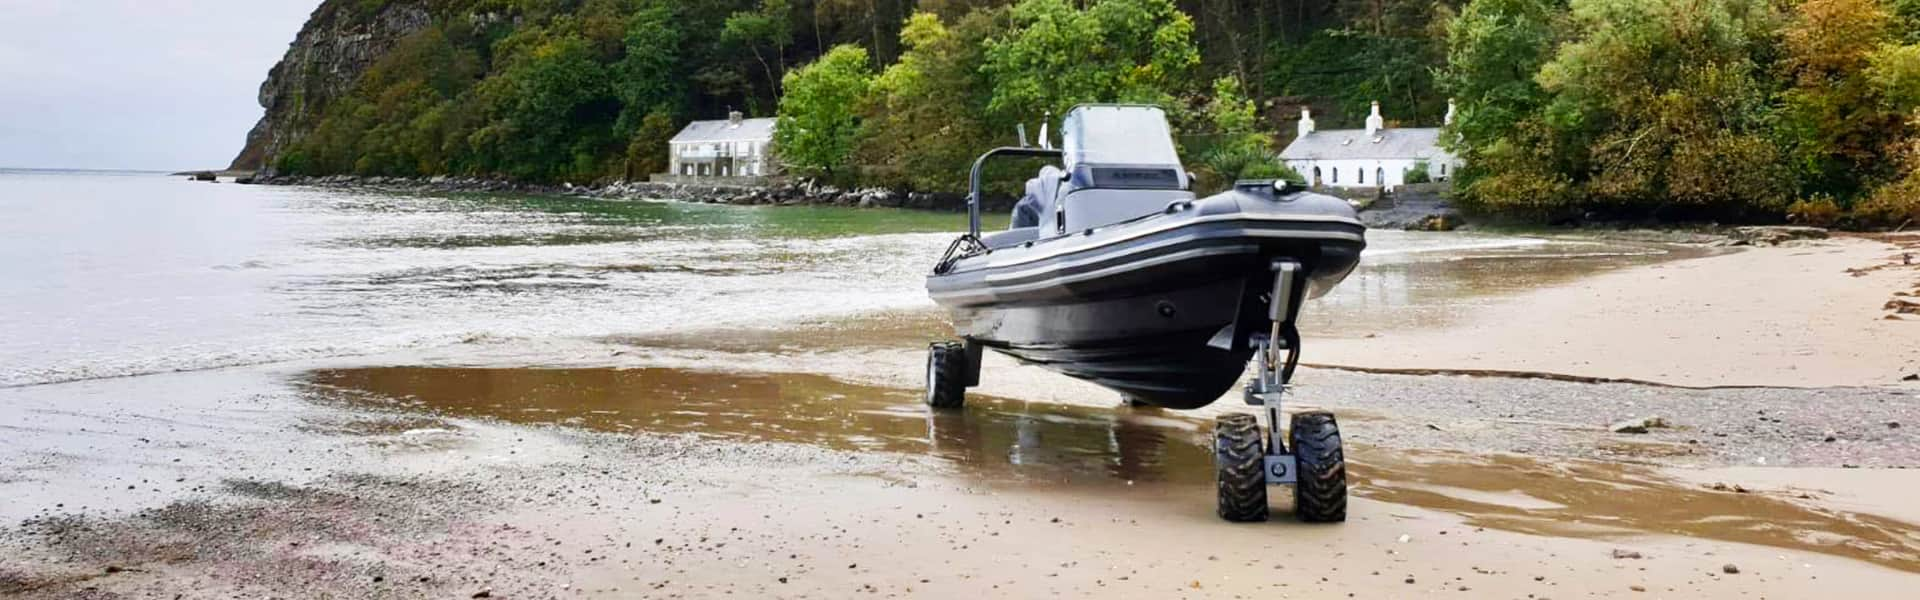 amphibious-professional-boats-7.1m-1